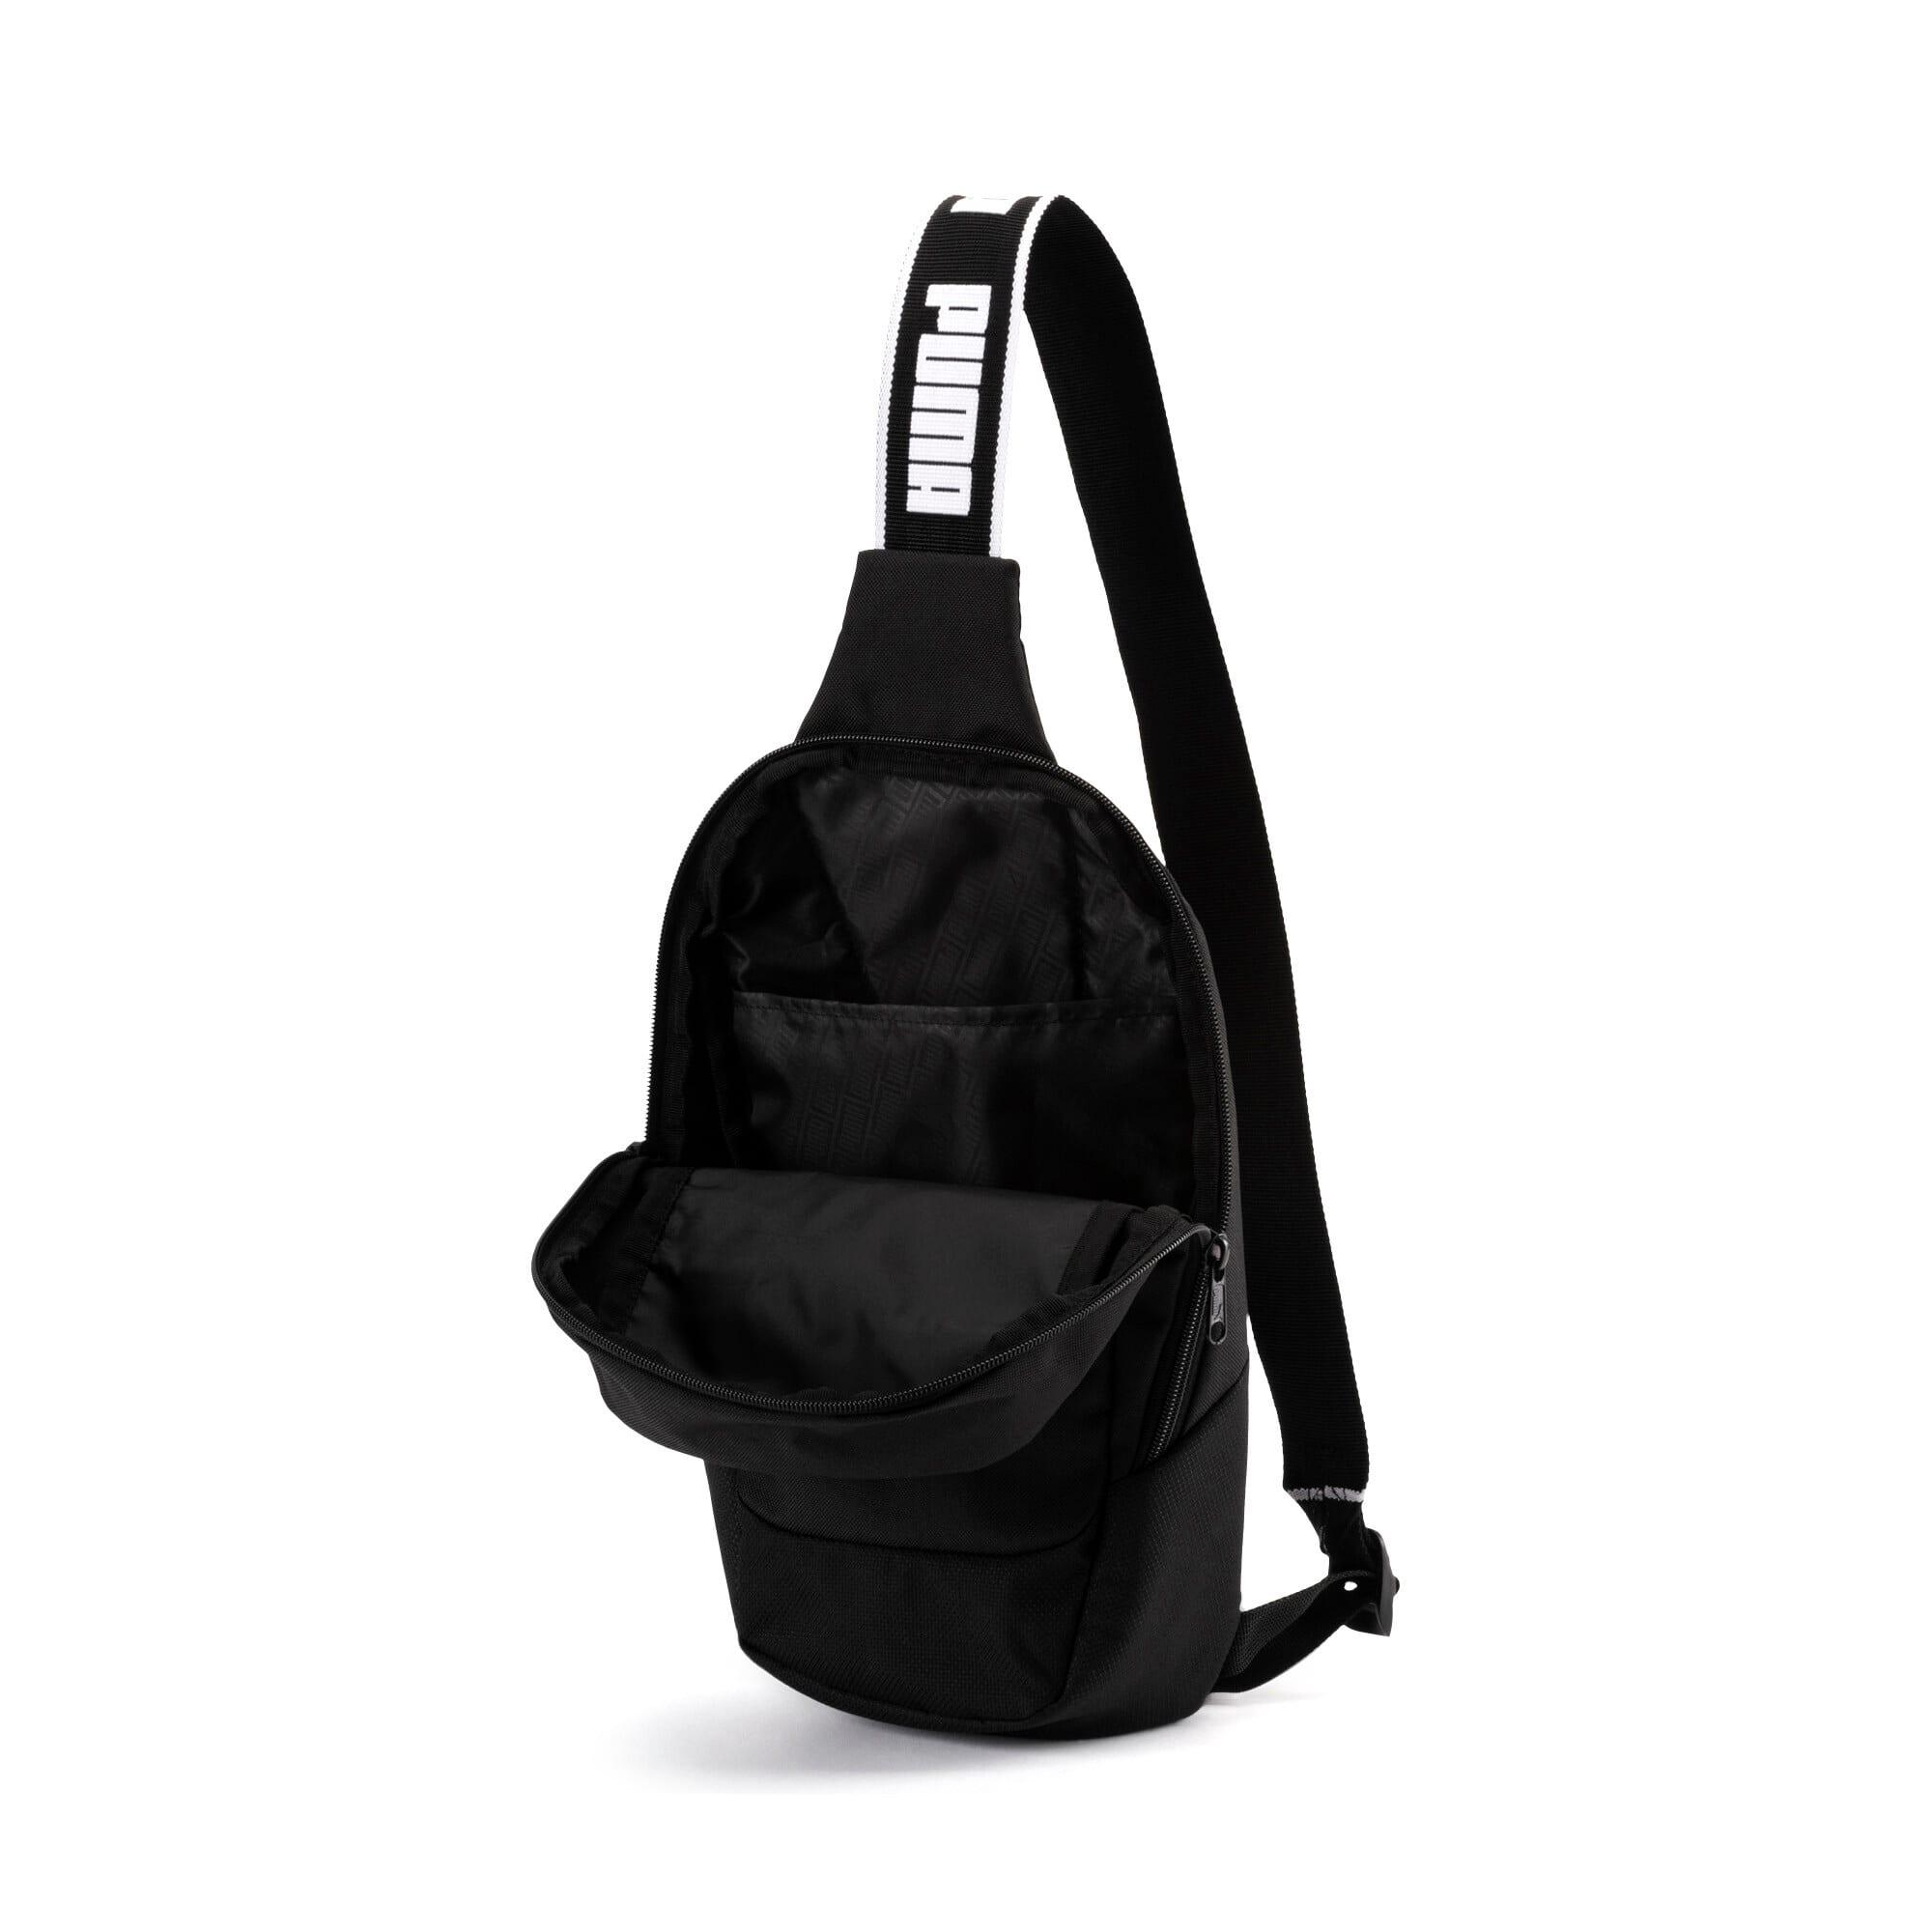 Thumbnail 3 of PUMA Sole Cross Body Bag, Puma Black, medium